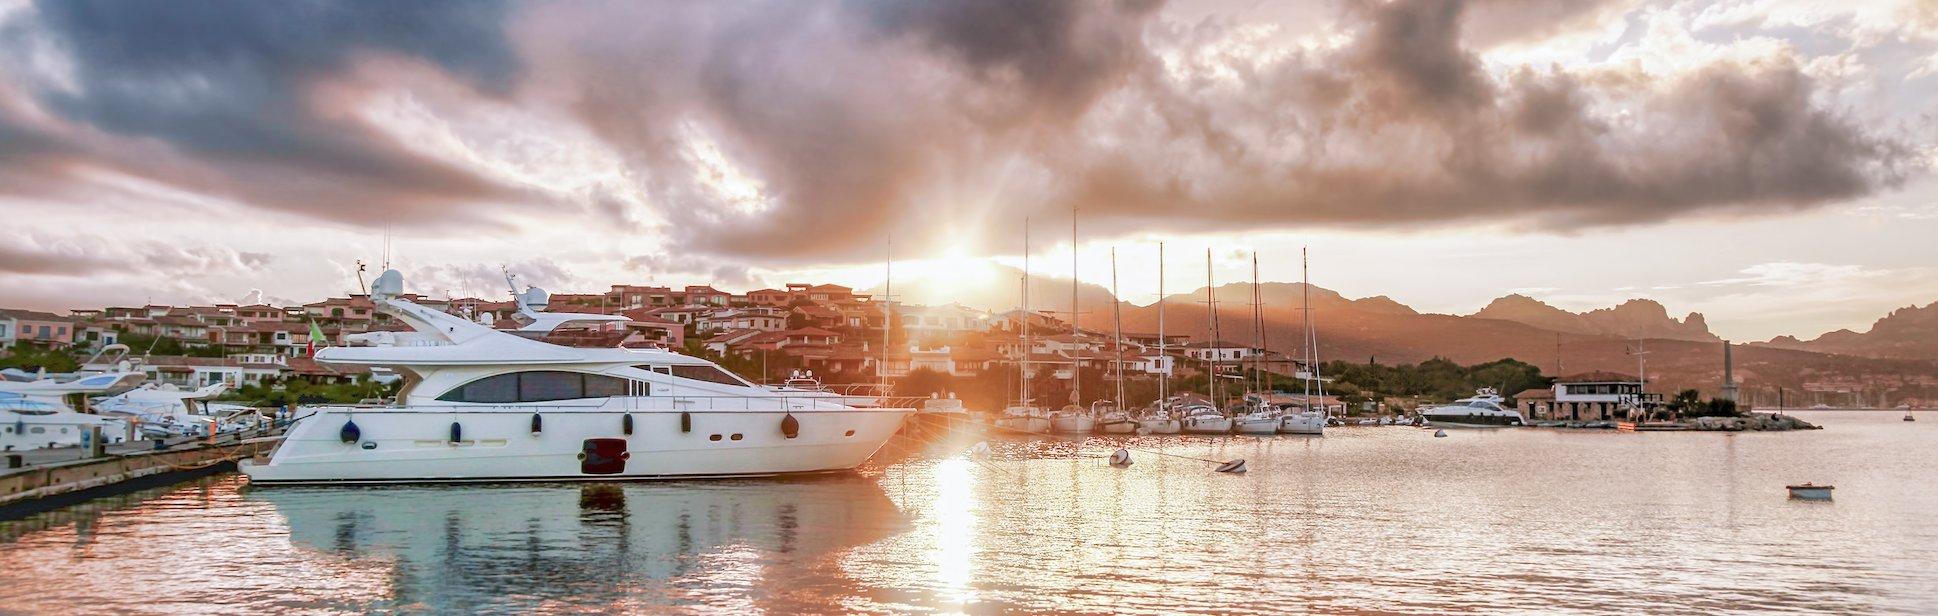 rent-motor-yacht-in-sardinia-charter-luxury